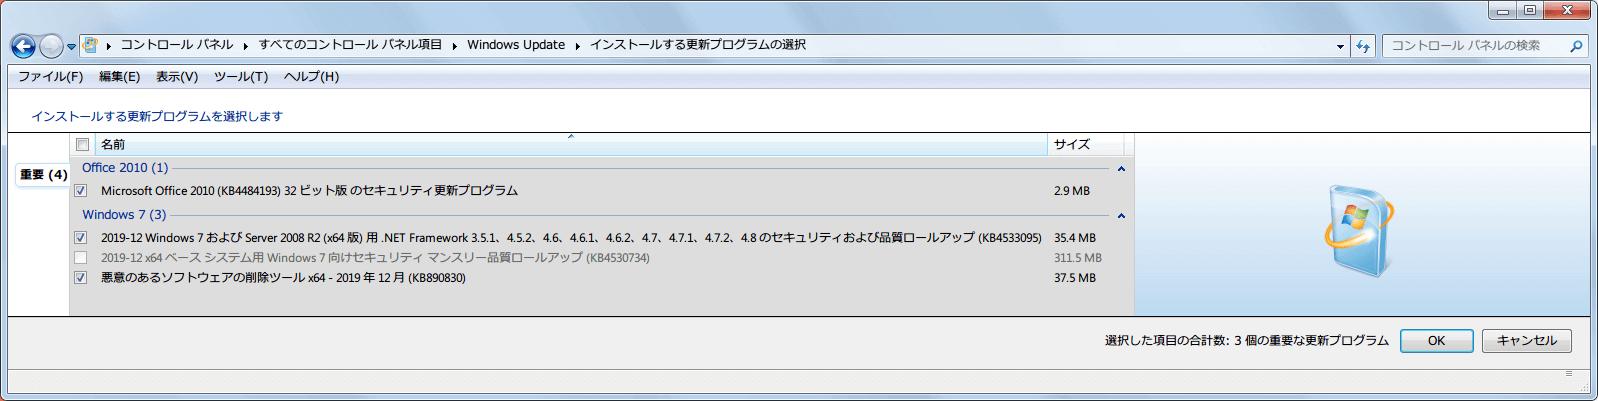 Windows 7 64bit Windows Update 重要 2019年12月分リスト KB4530734 非表示